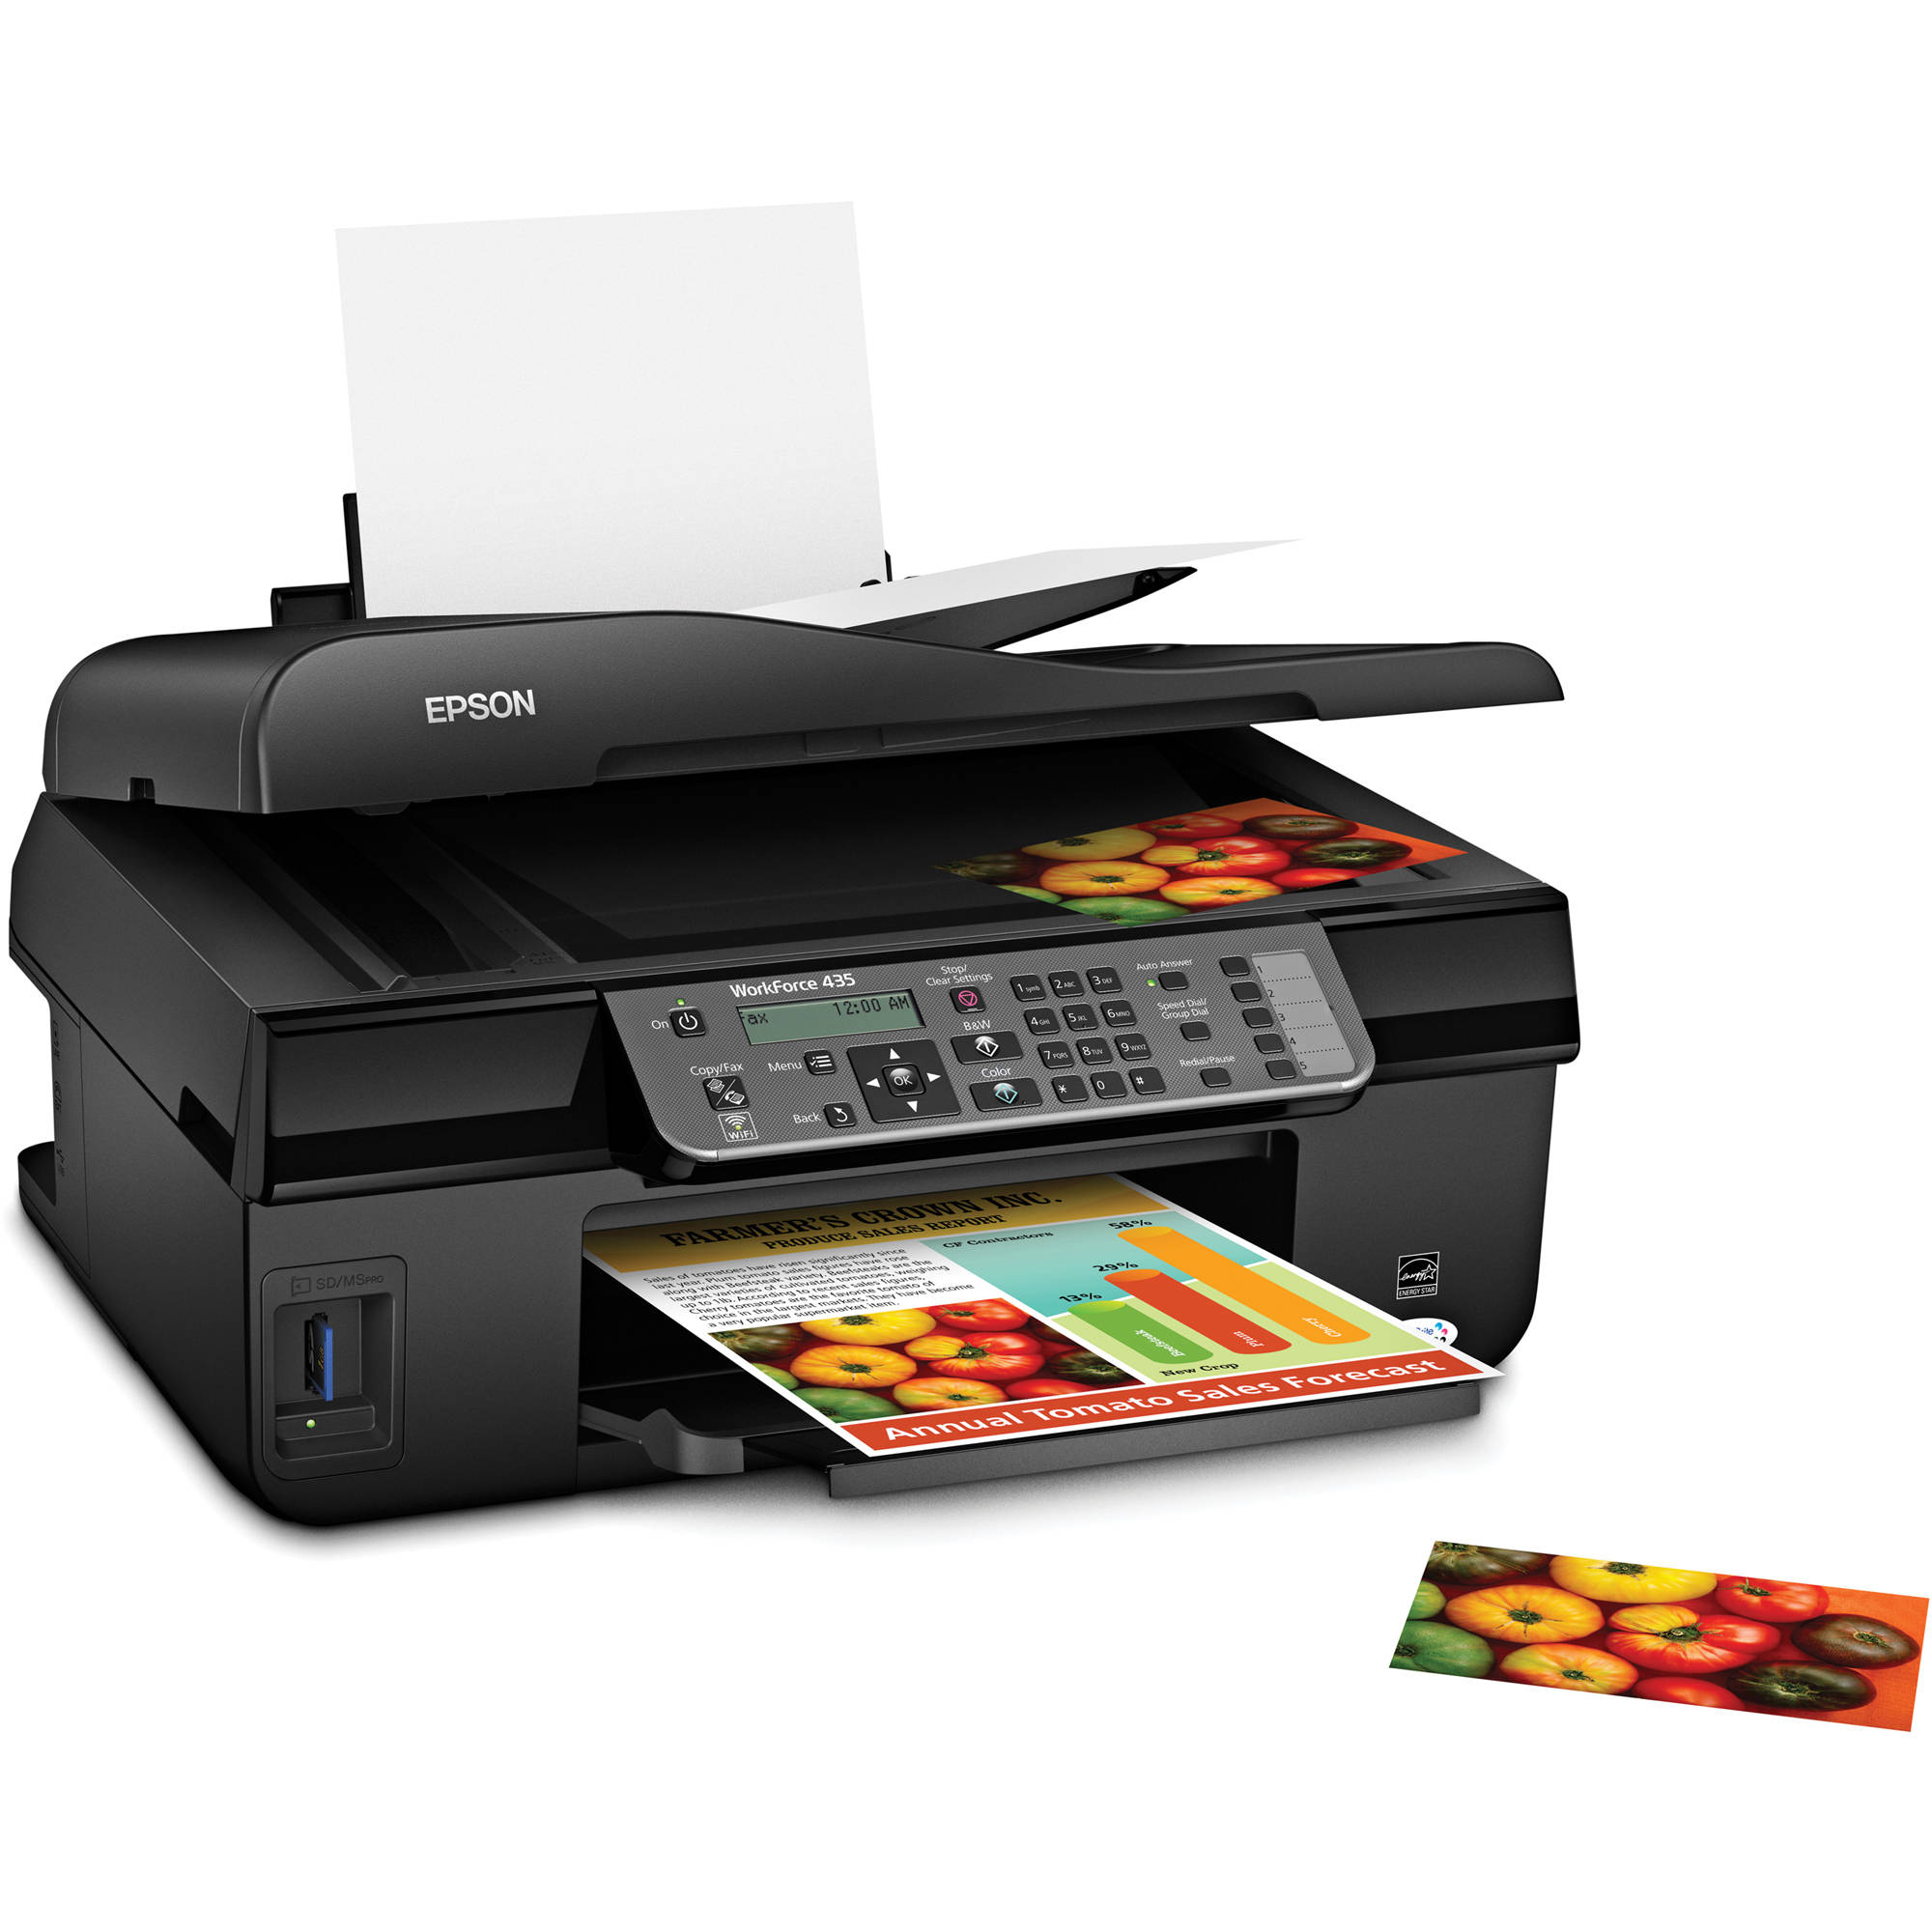 Best Color Inkjet Printer For Photos